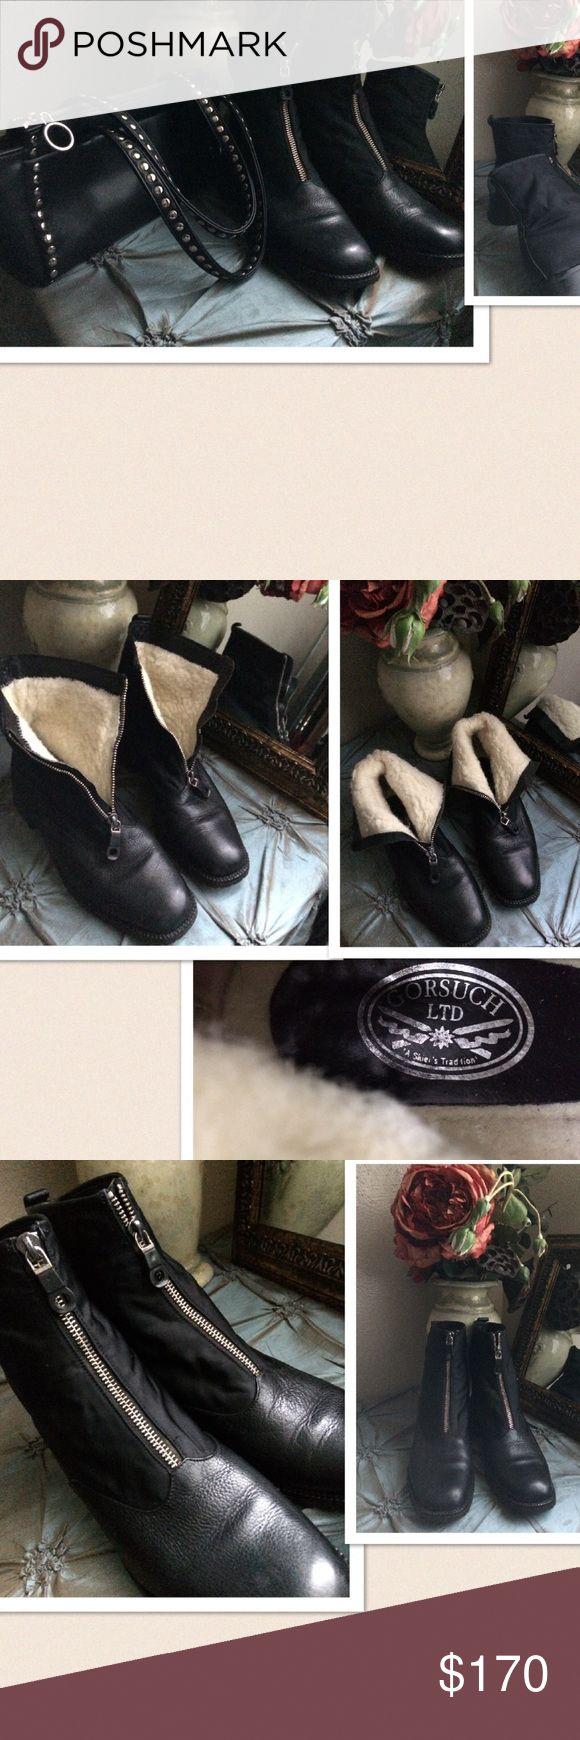 "Gorsuch Ltd Vibram Boots Shearling Gorsuch Ltd Vibram Boots. Shearling inside. Size: 37.5. Shaft: 6 1/4"", circumference: 11"". Zipper front closure. New without box. Gorsuch Ltd Shoes"